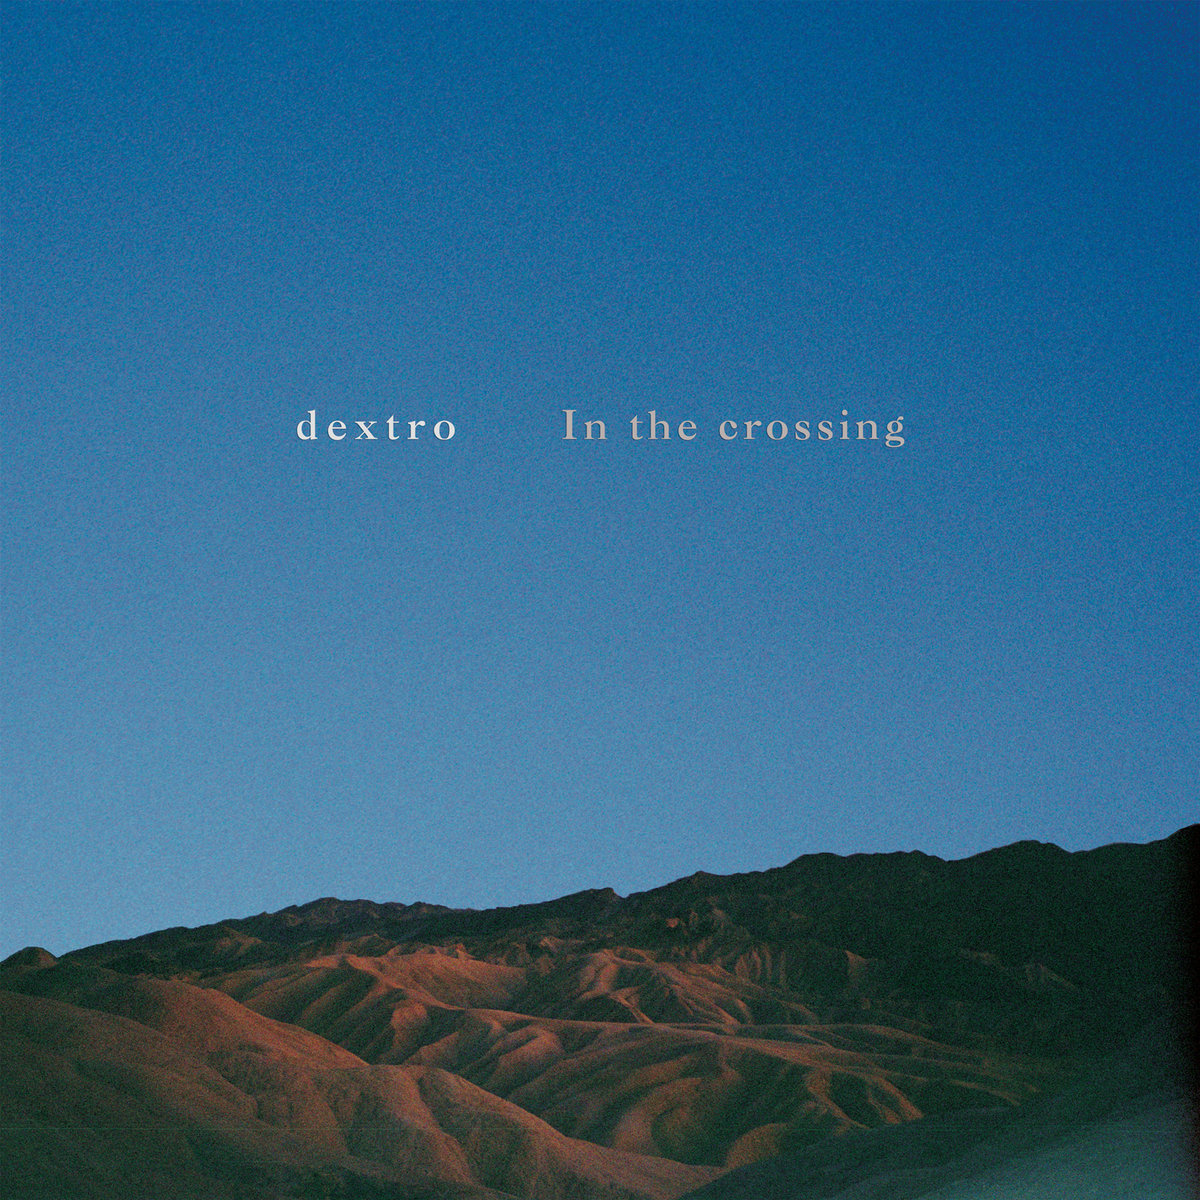 Dextro ~ In thecrossing